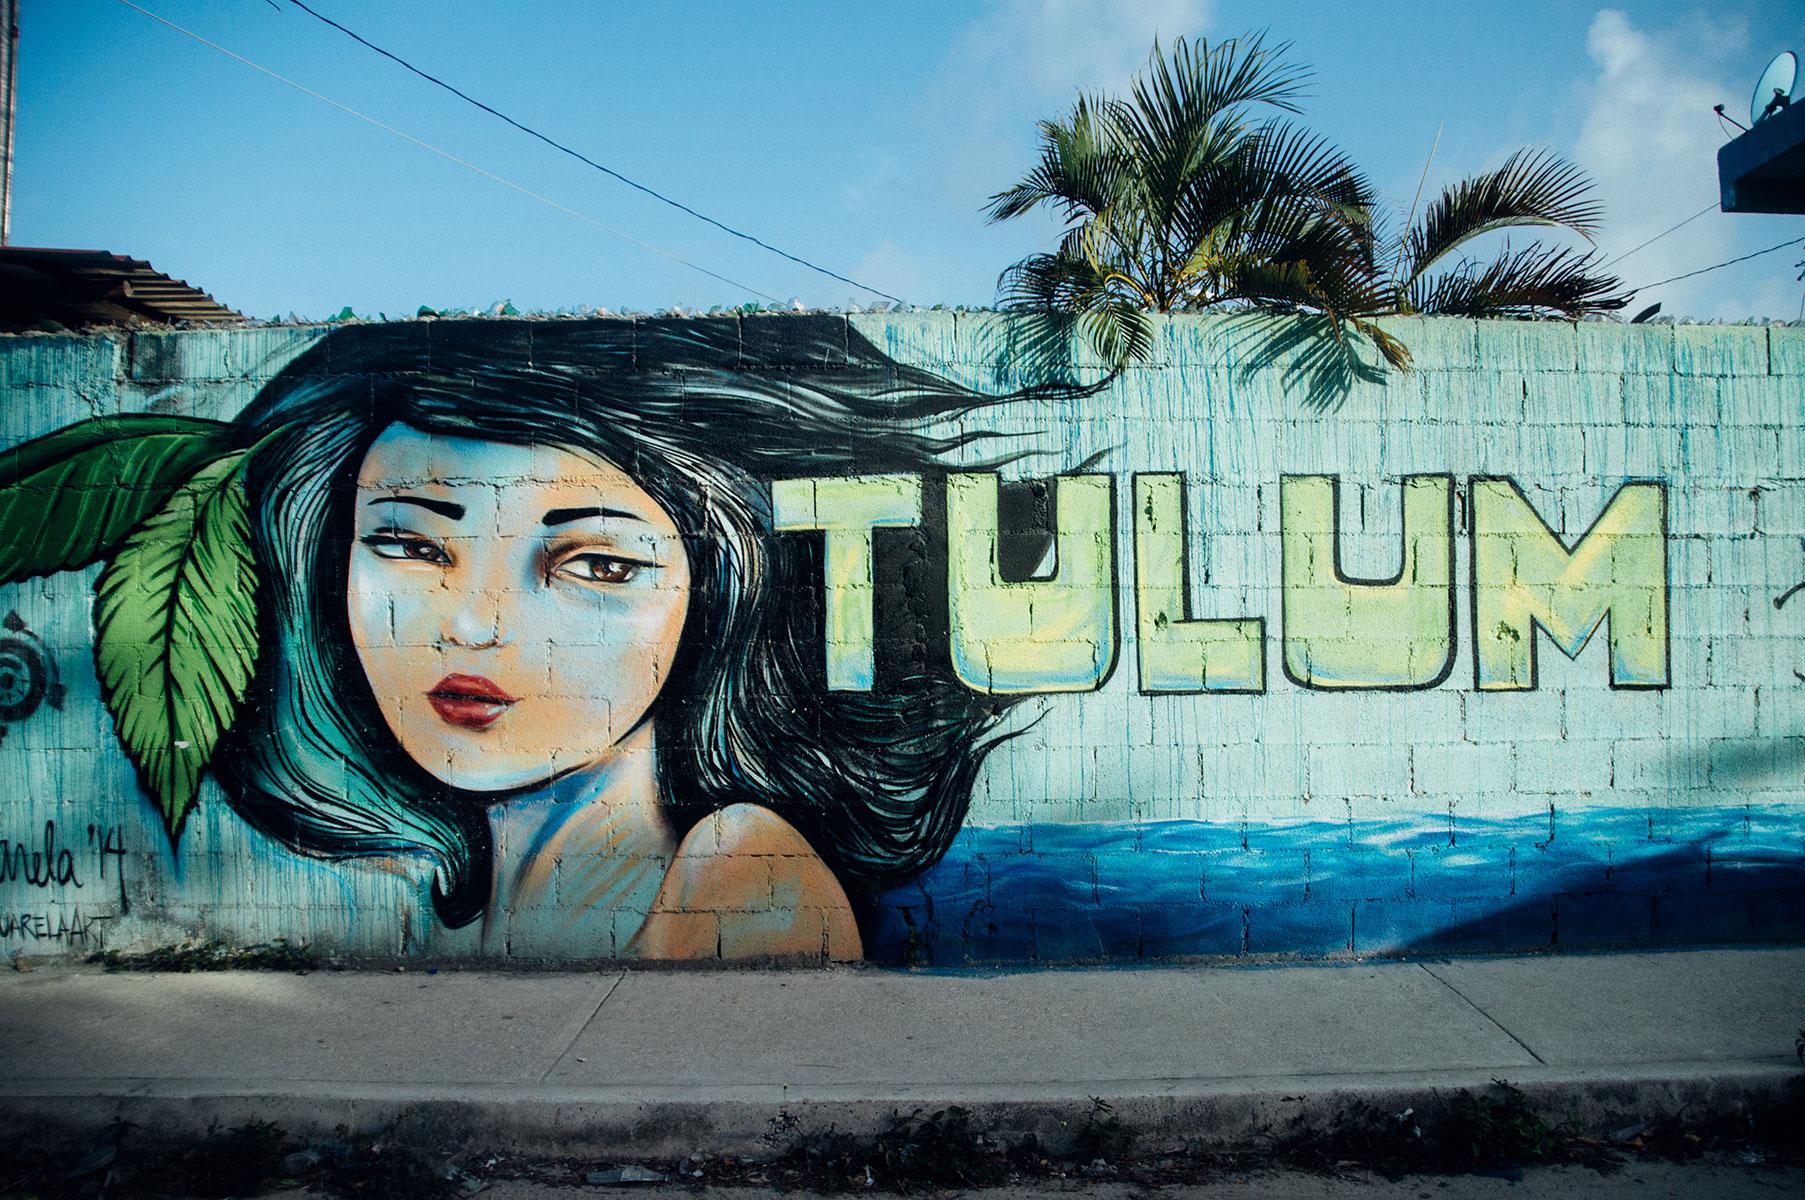 Tulum street art blog voyages